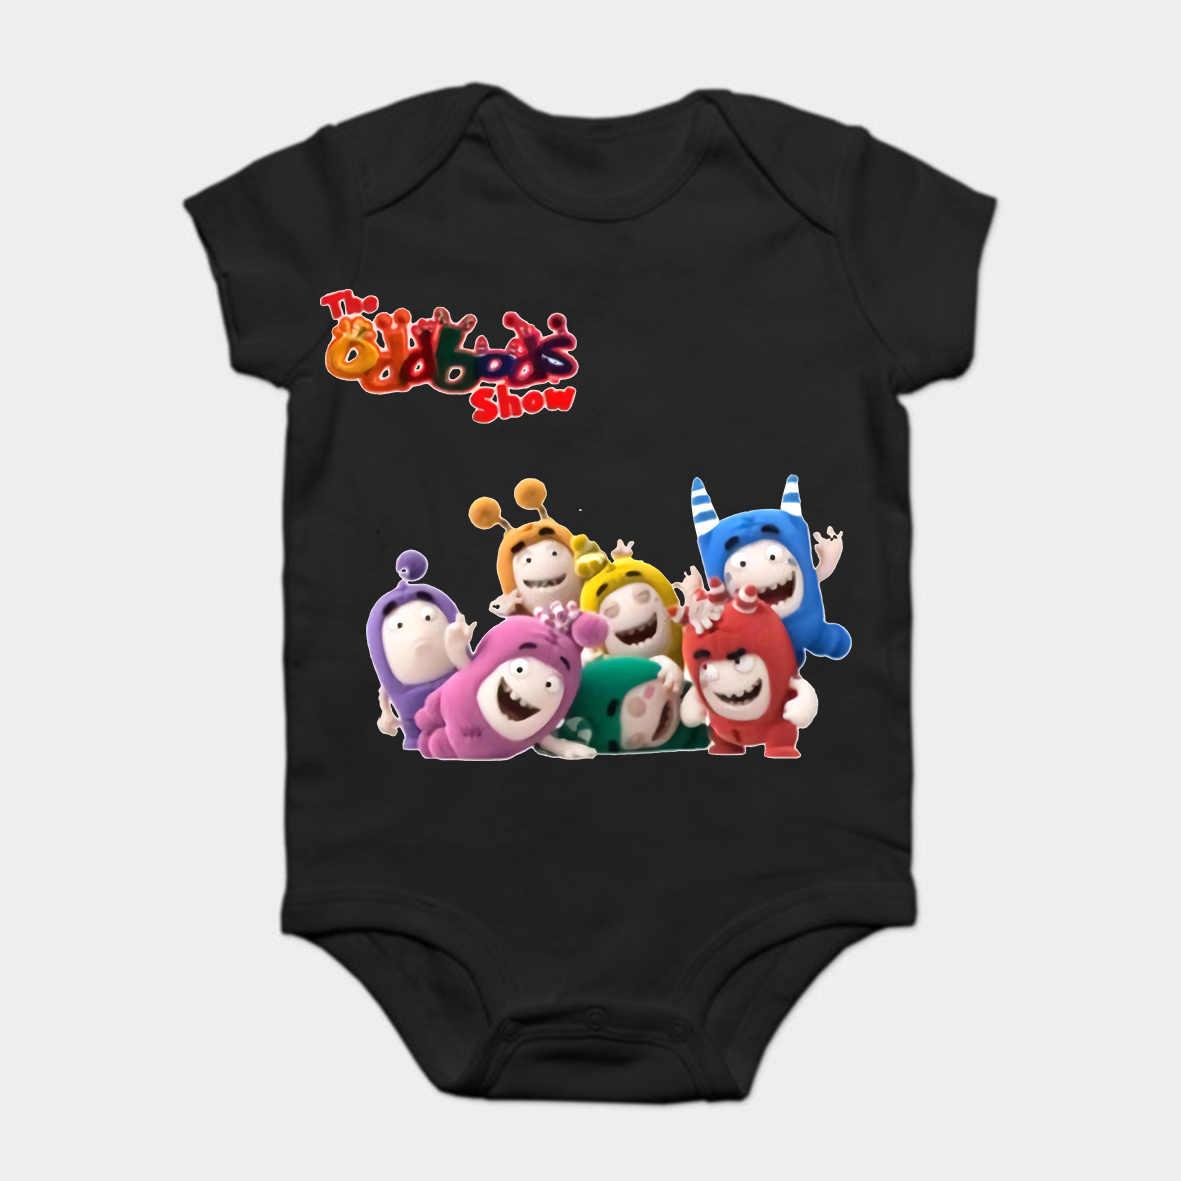 b78a1a61522e Baby Onesie Baby Bodysuits kid t shirt Oddbods Show Time Cartoon